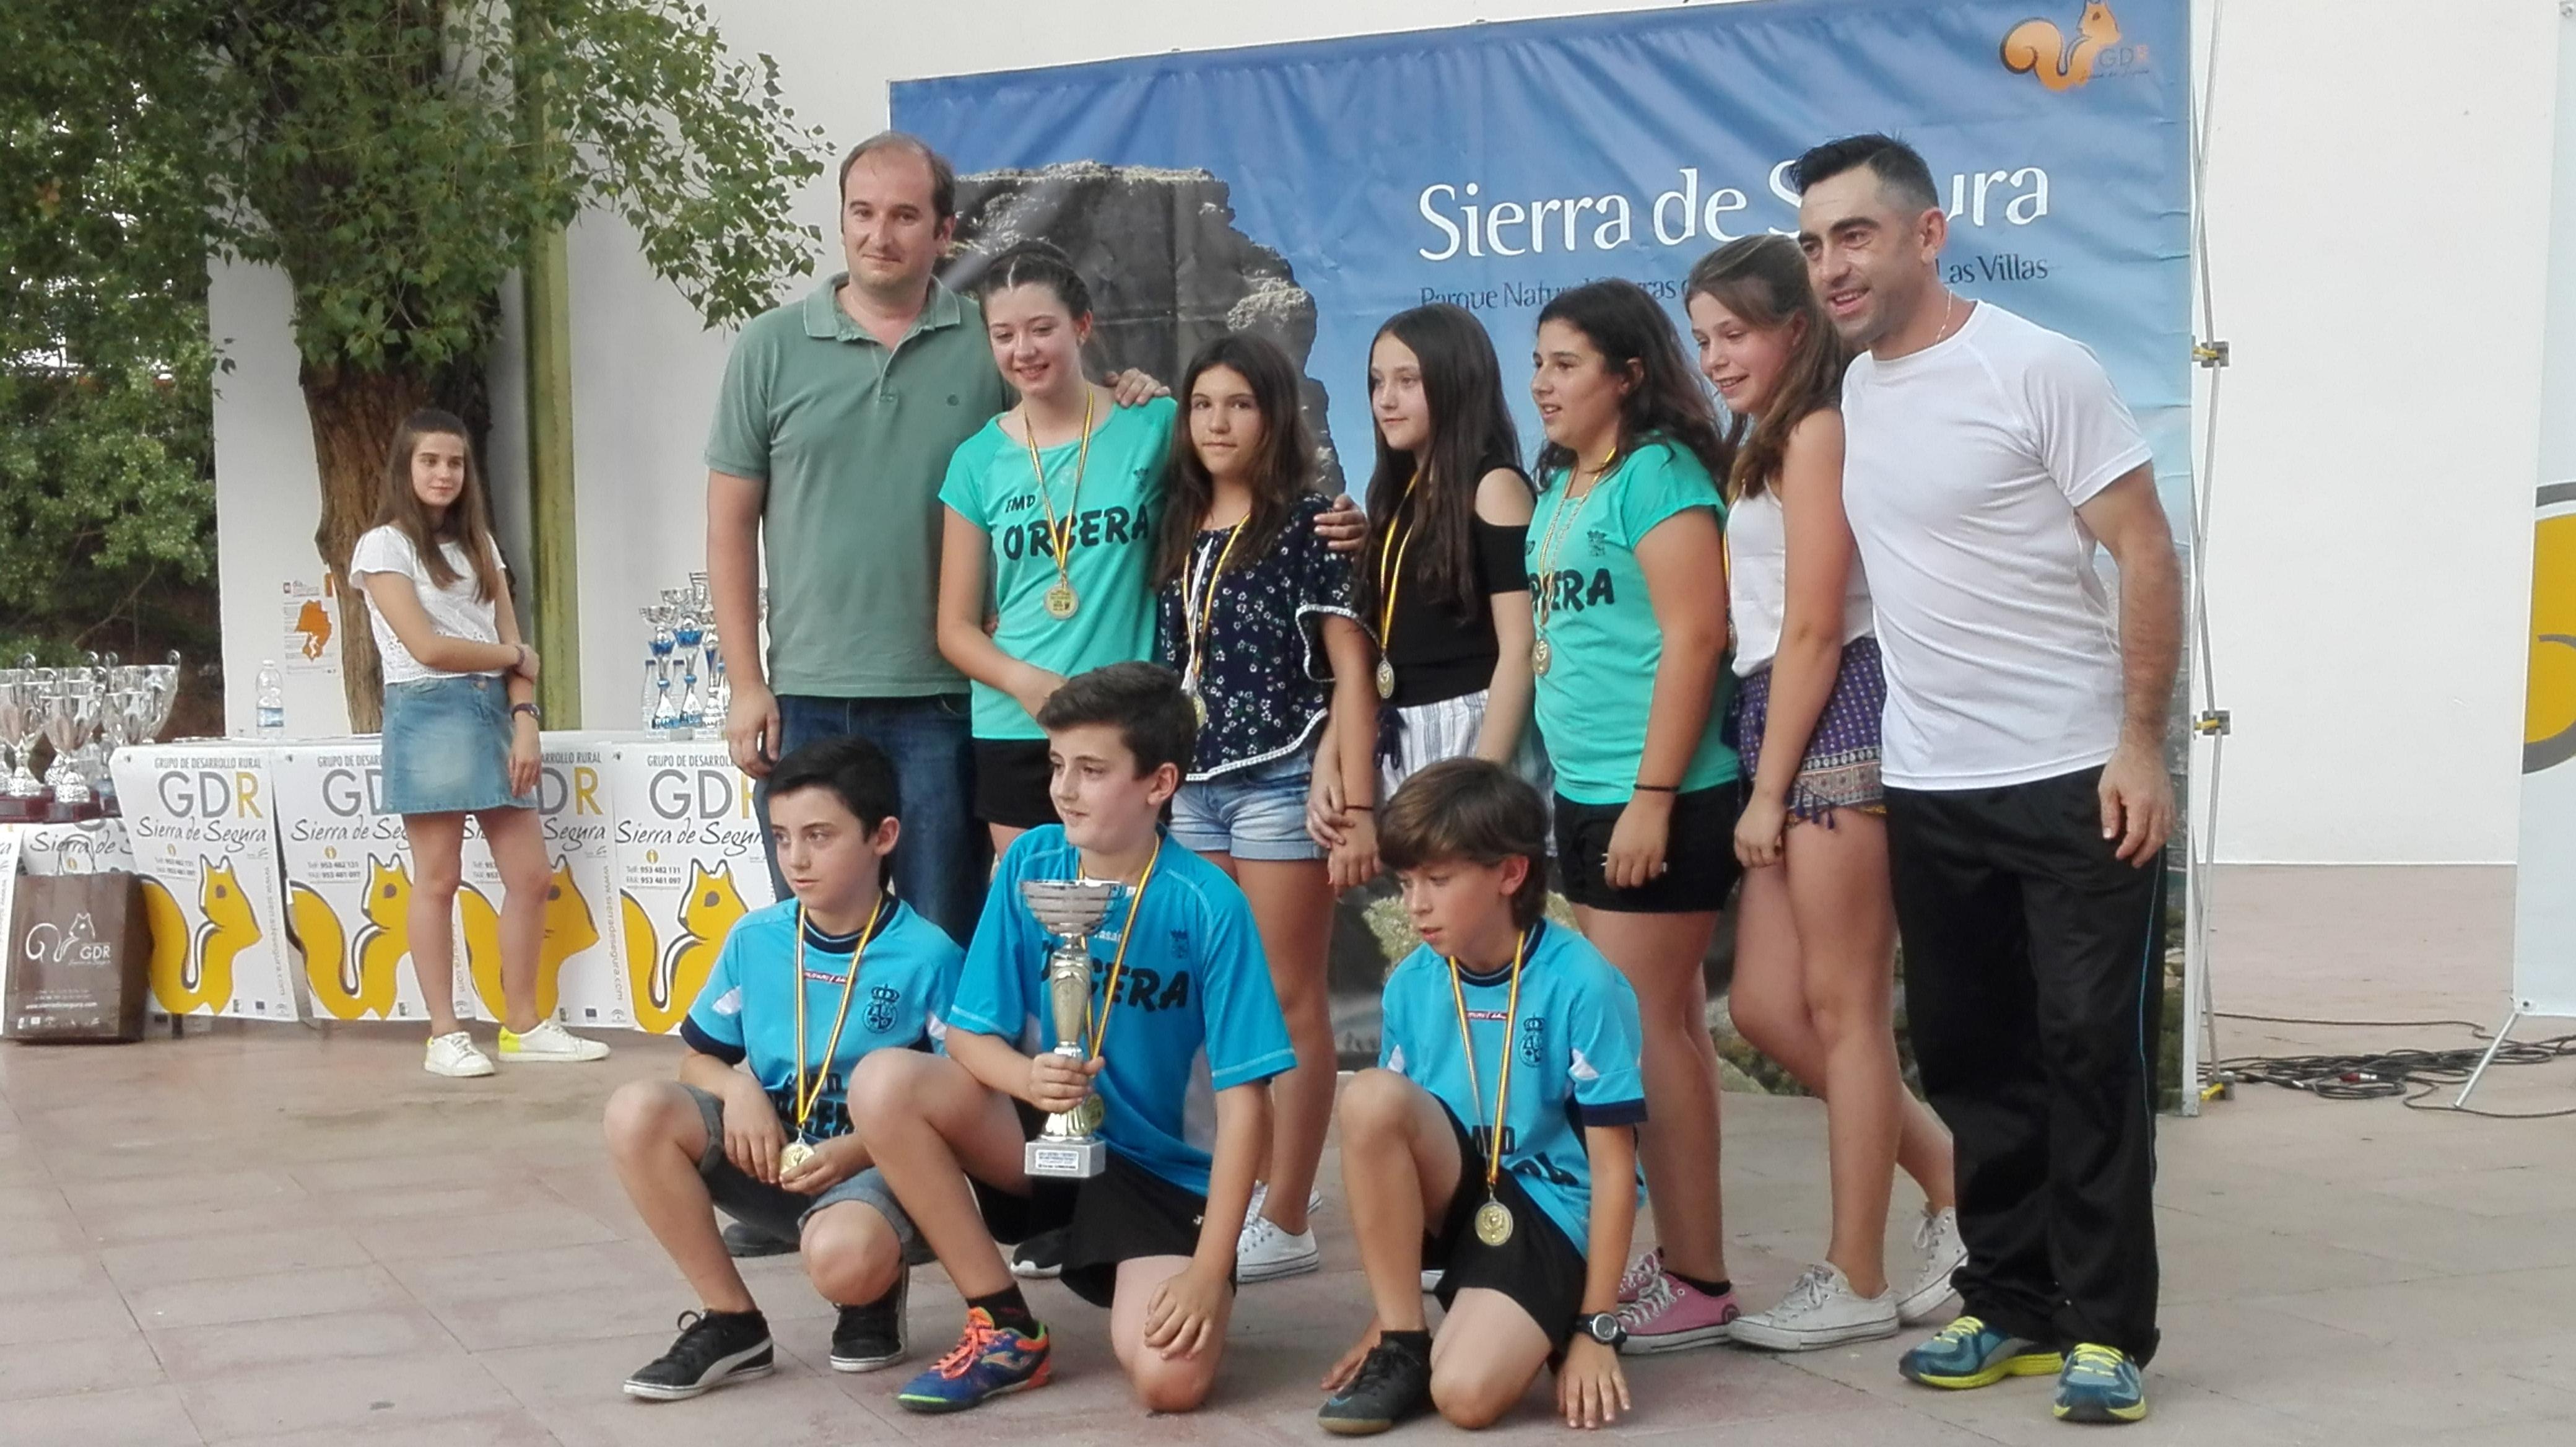 Gala del deporte comarcal en la puerta 10 6 17 deporte for Piscina municipal de orcera